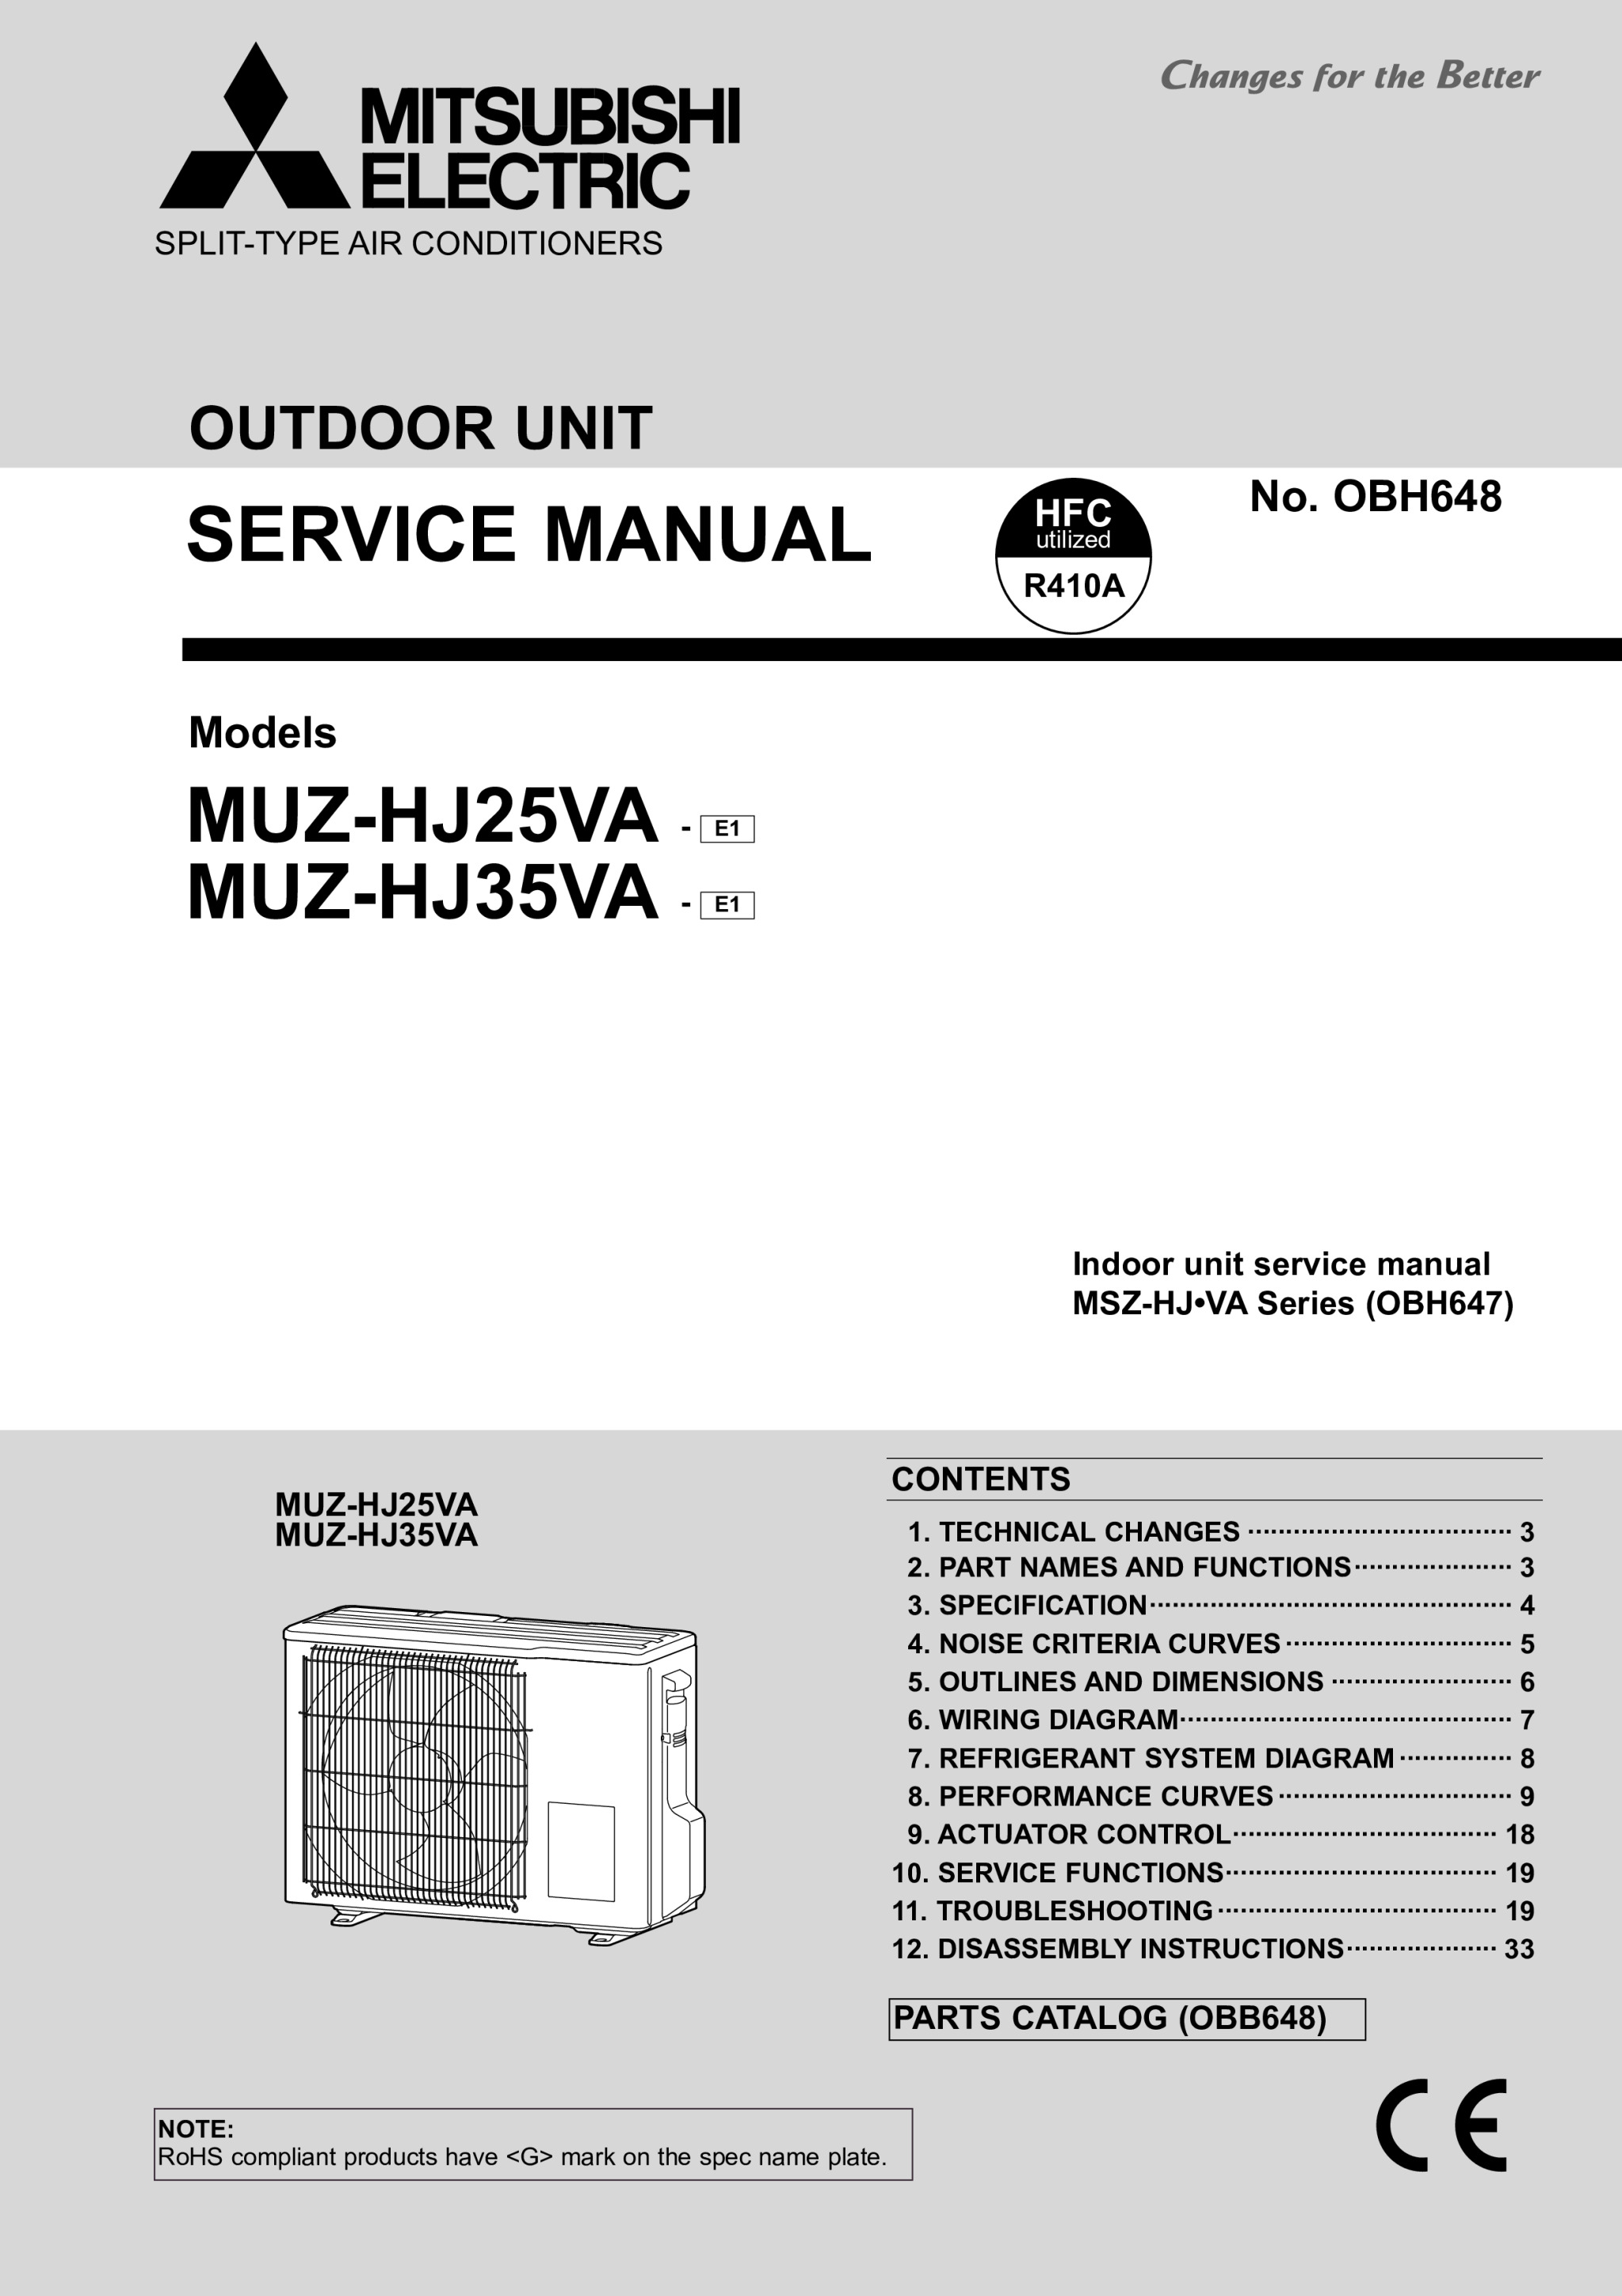 Mitsubishi R410a Wiring Diagram Library Inverter Air Conditioner Service Manual Sante Blog Page 1 Zoom In Terrific Contemporary